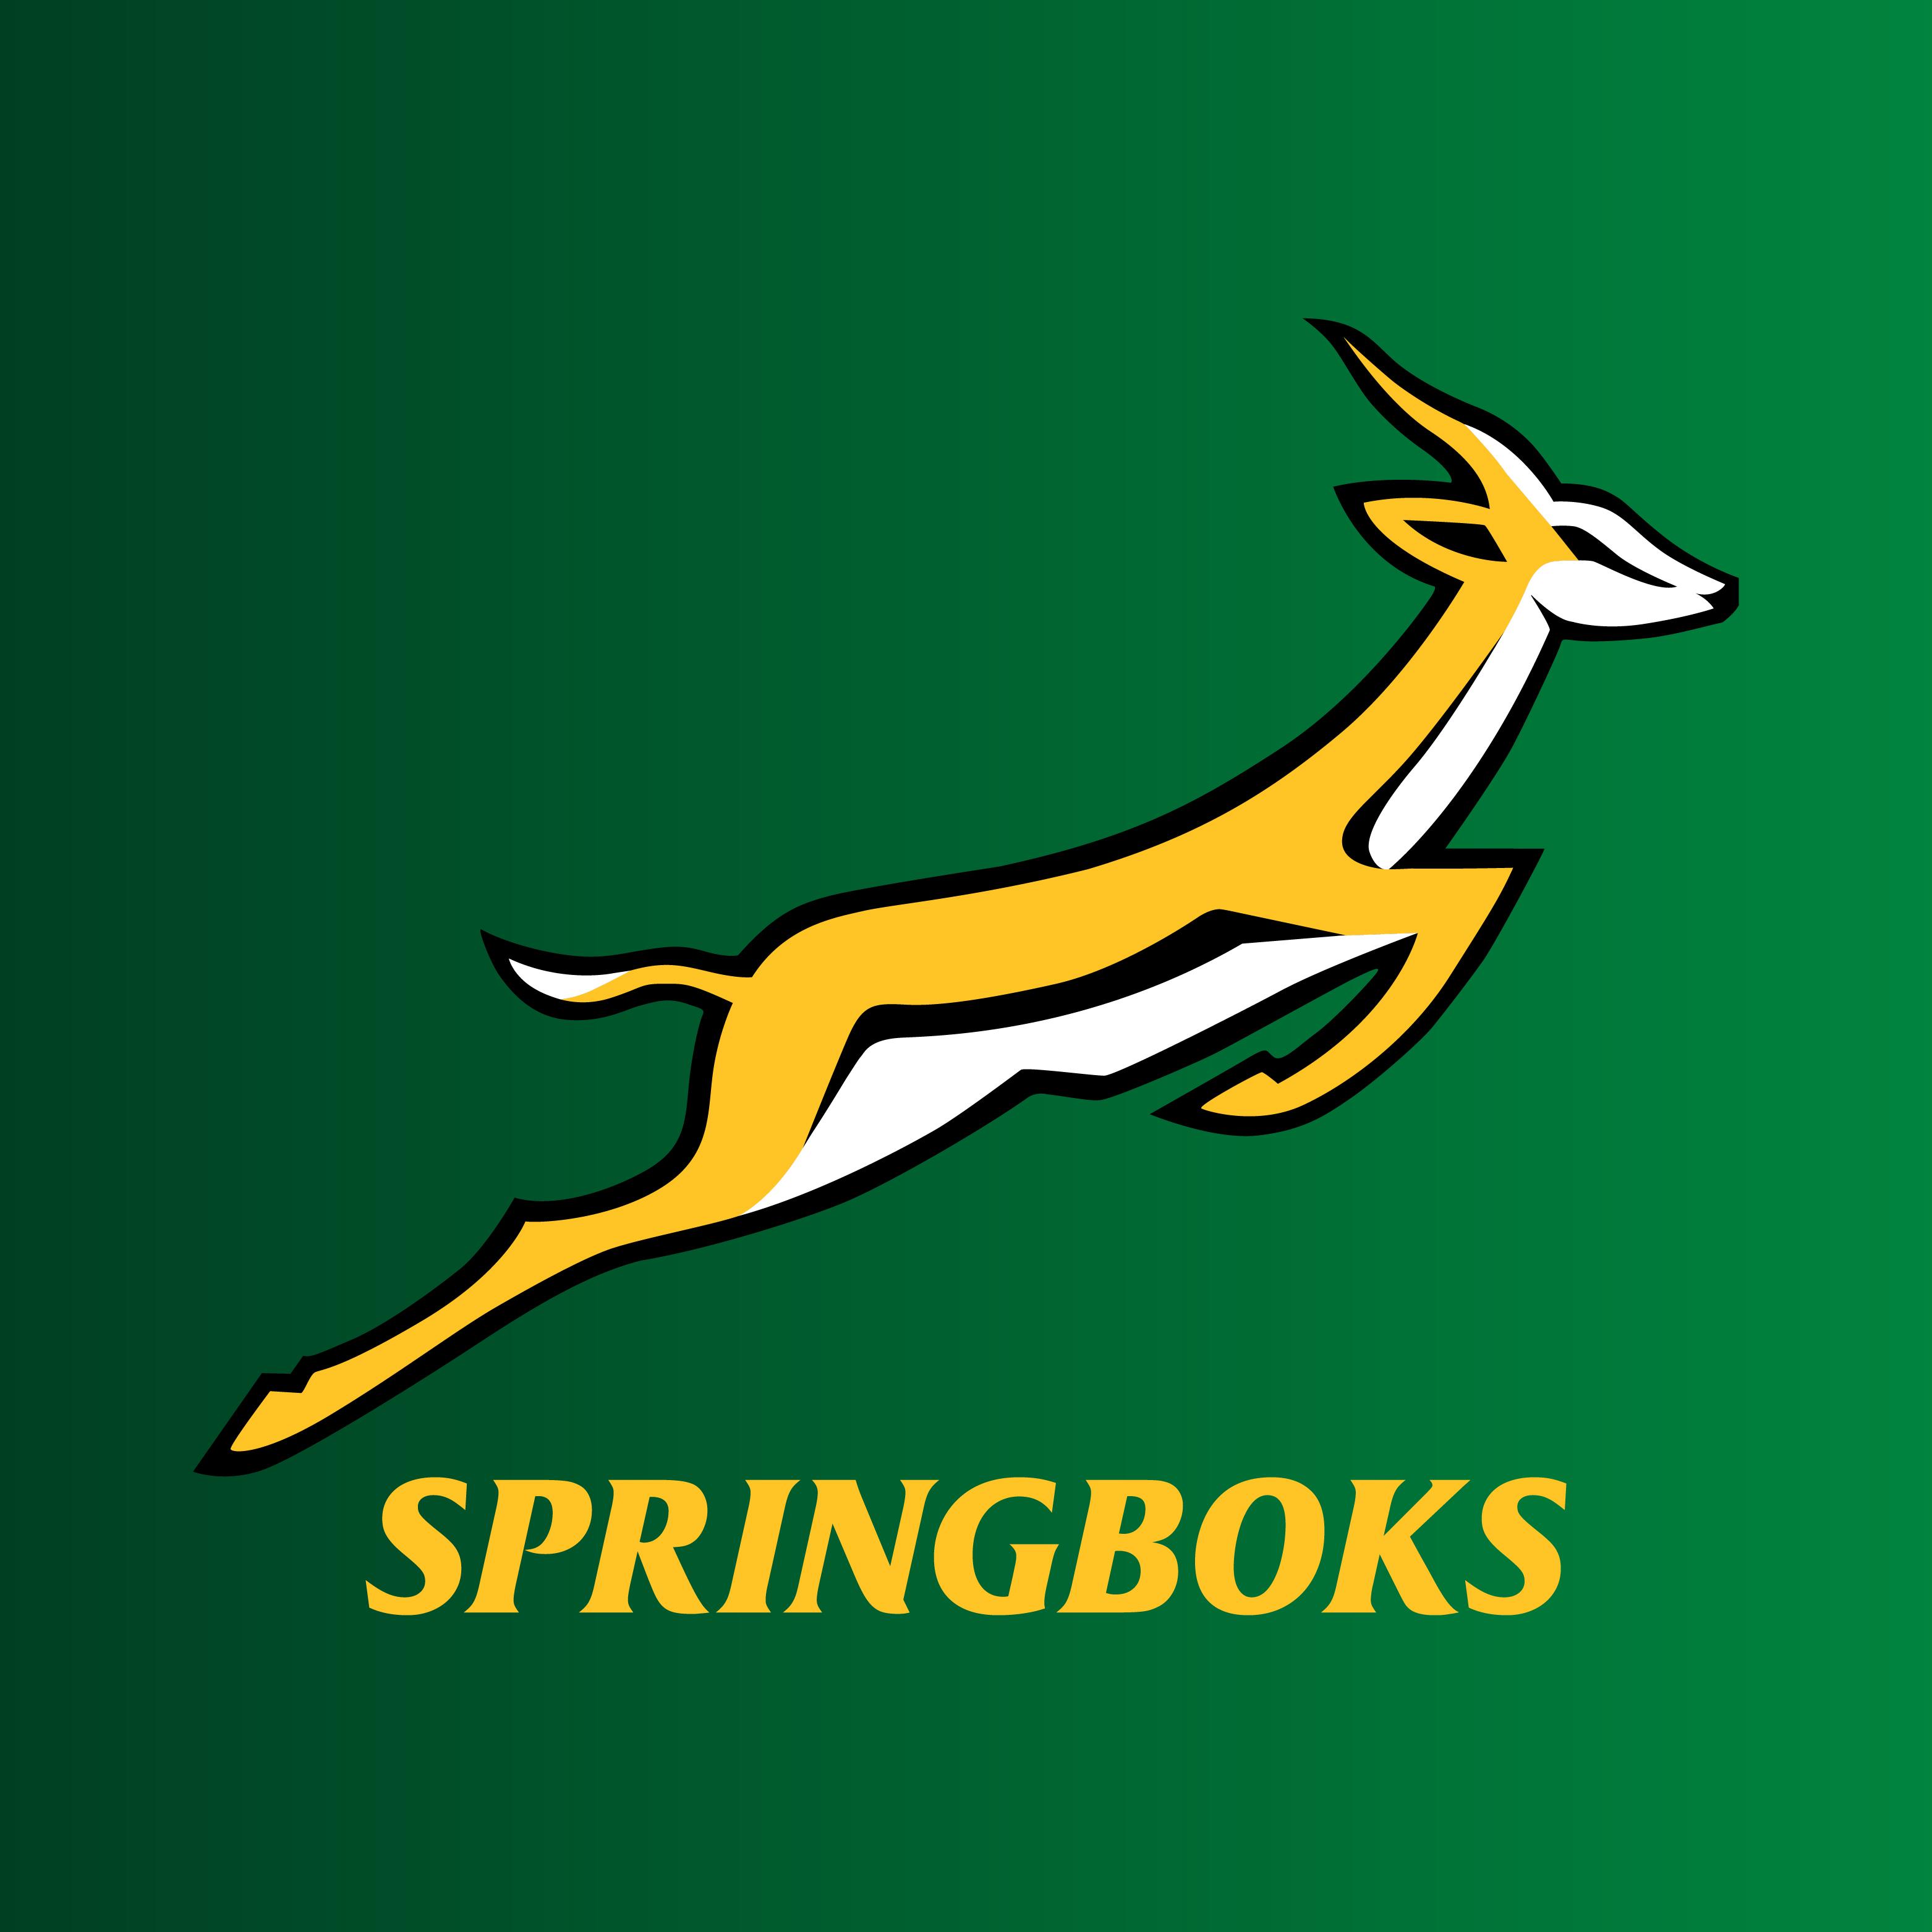 Design Squad Website >> Springbok Logo | www.imgkid.com - The Image Kid Has It!